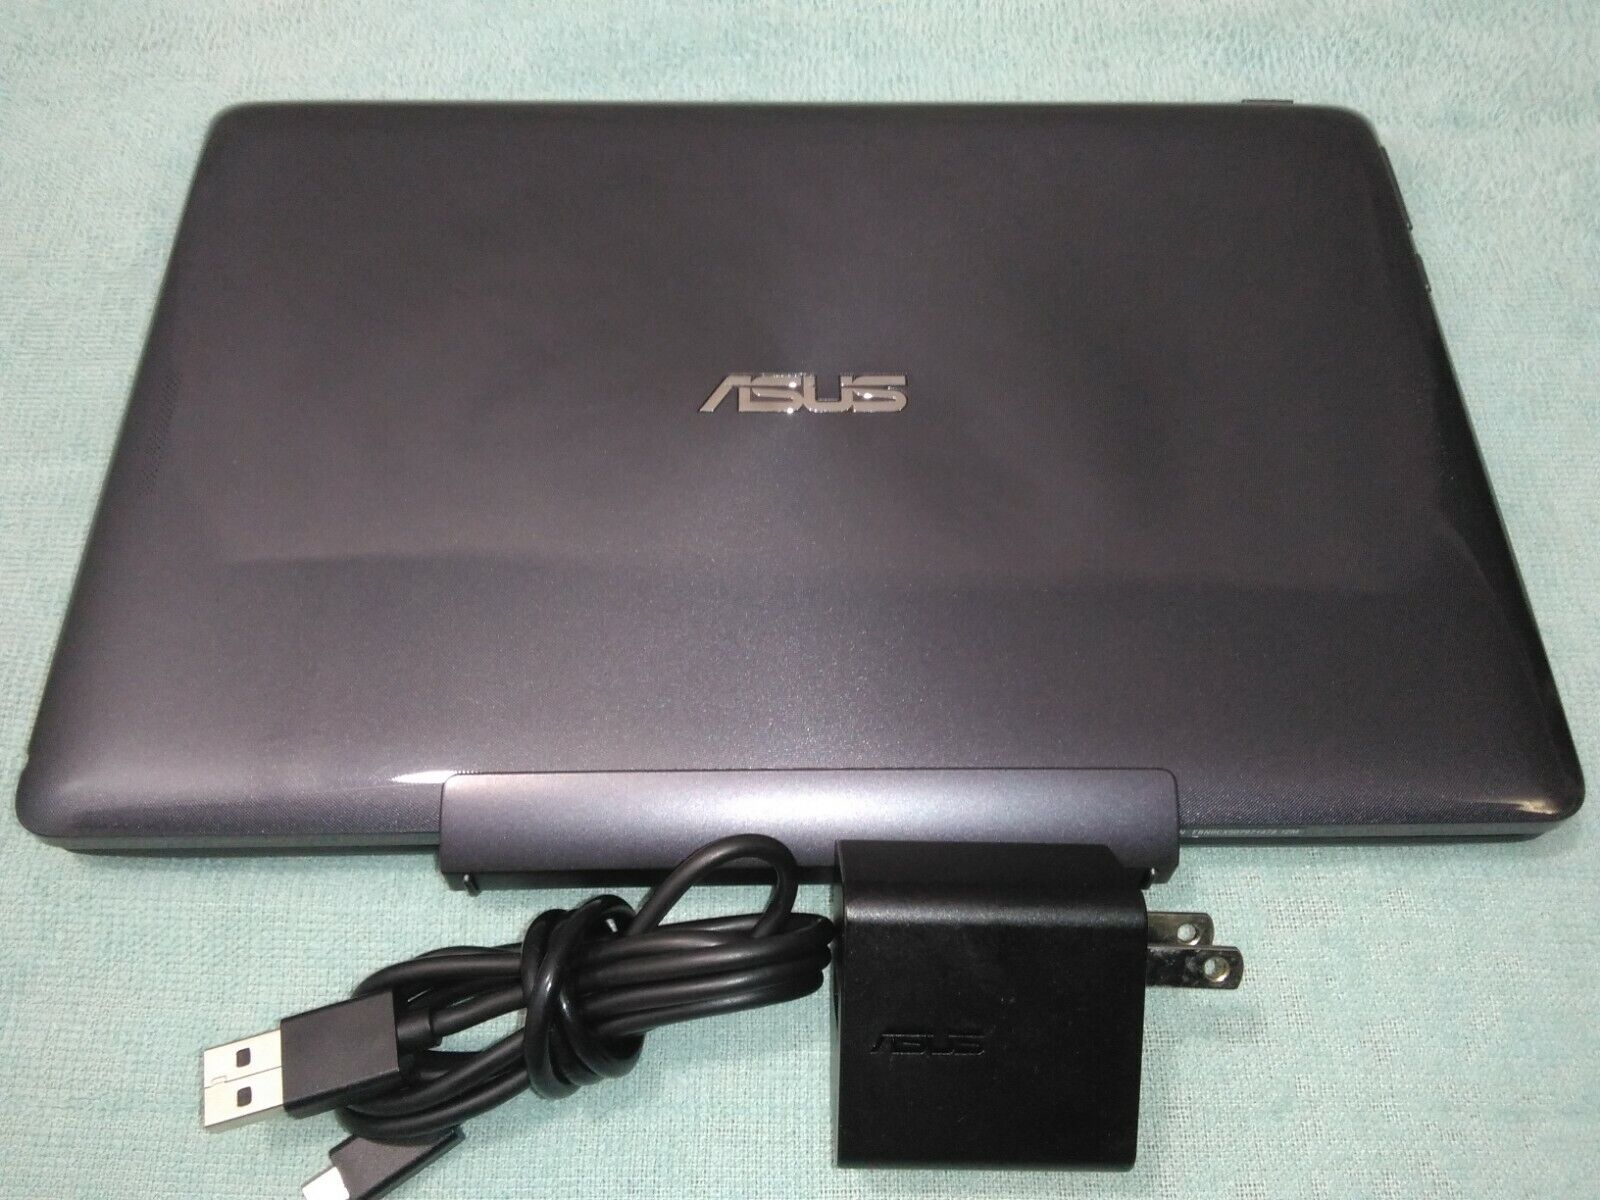 "Laptop Windows - ASUS T100TAF 10.1"" Transformer 2-in-1 Laptop Tablet Touchscreen 32GB Windows 8.1"